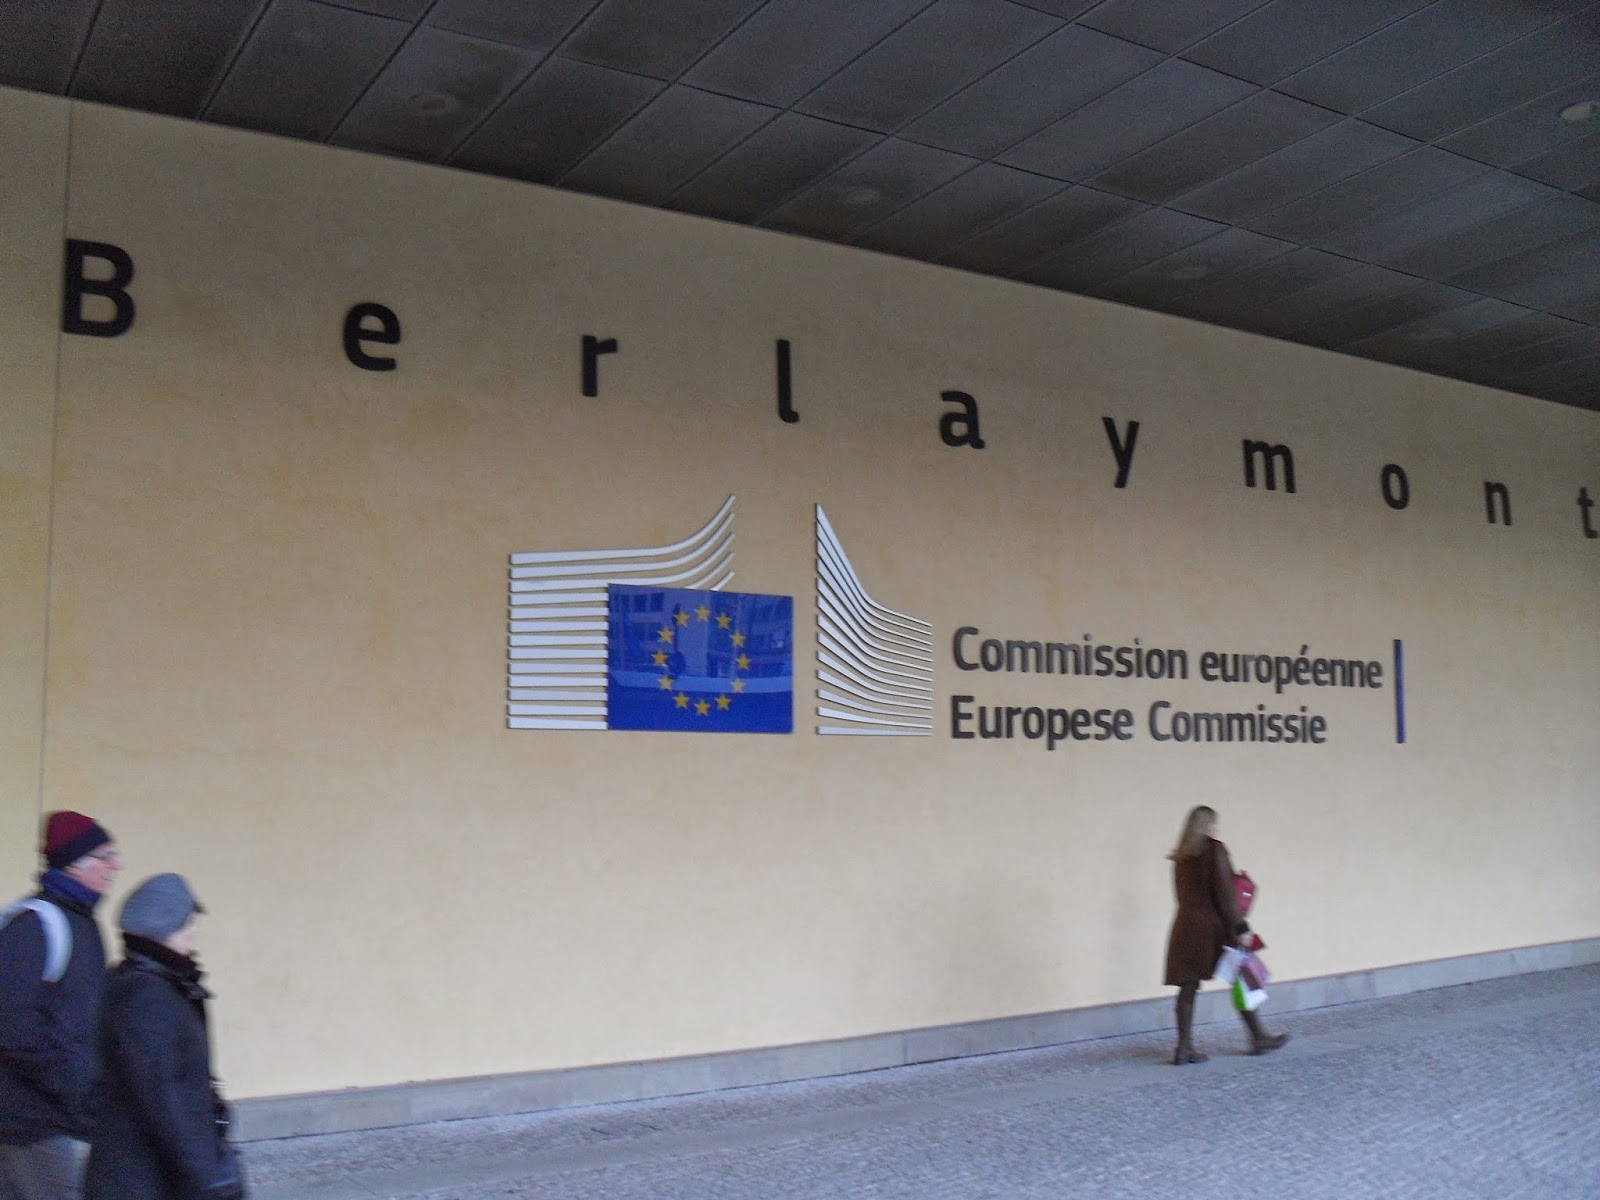 Edificio Berlaymont, sede de la Comisión Europea